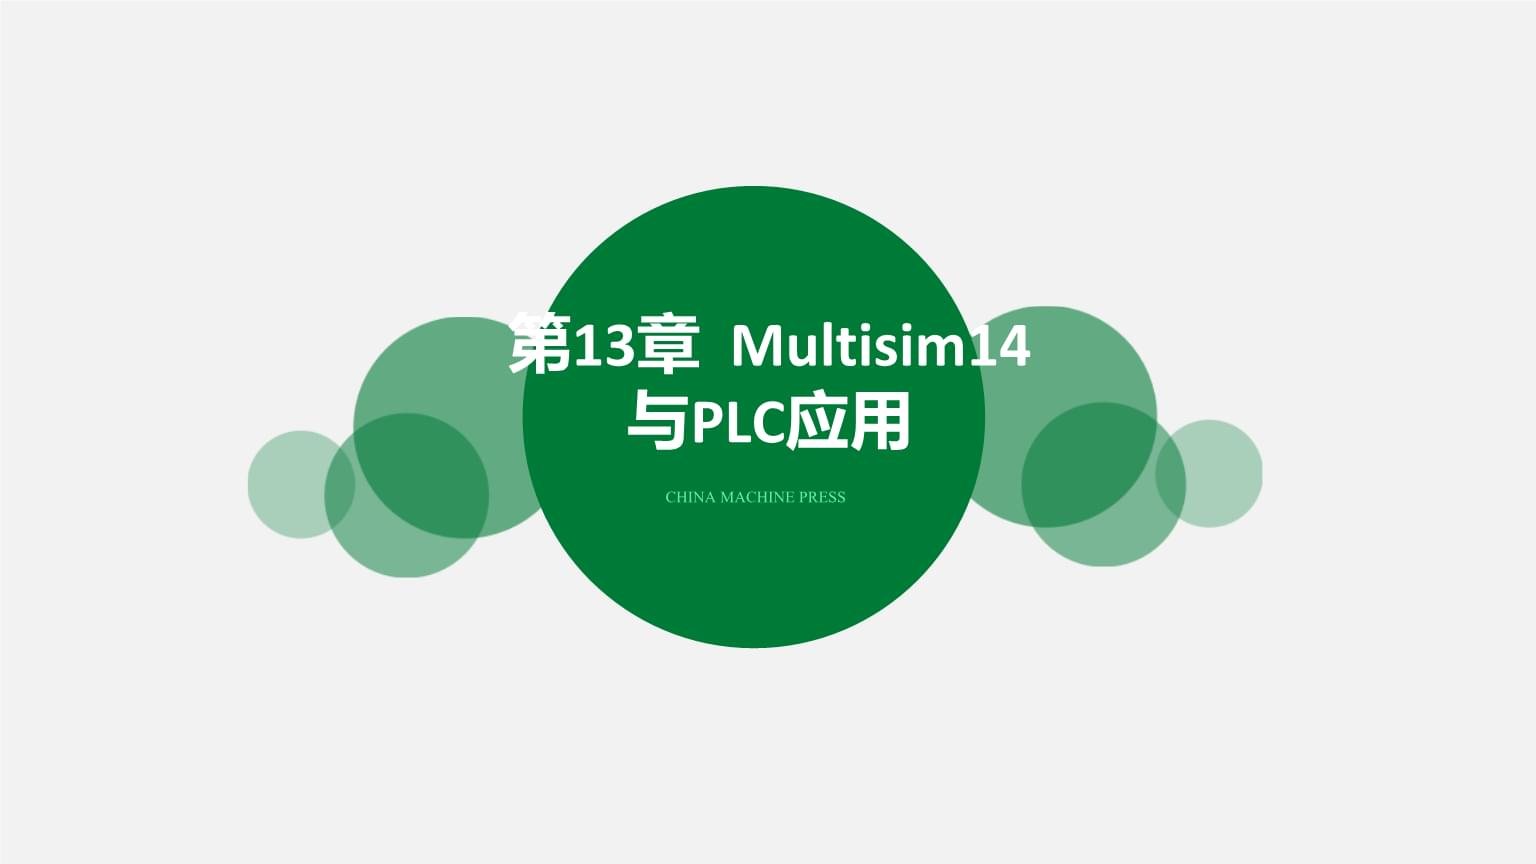 Multisim14电子系统仿真与设计第13章  Multisim14与PLC应用.ppt